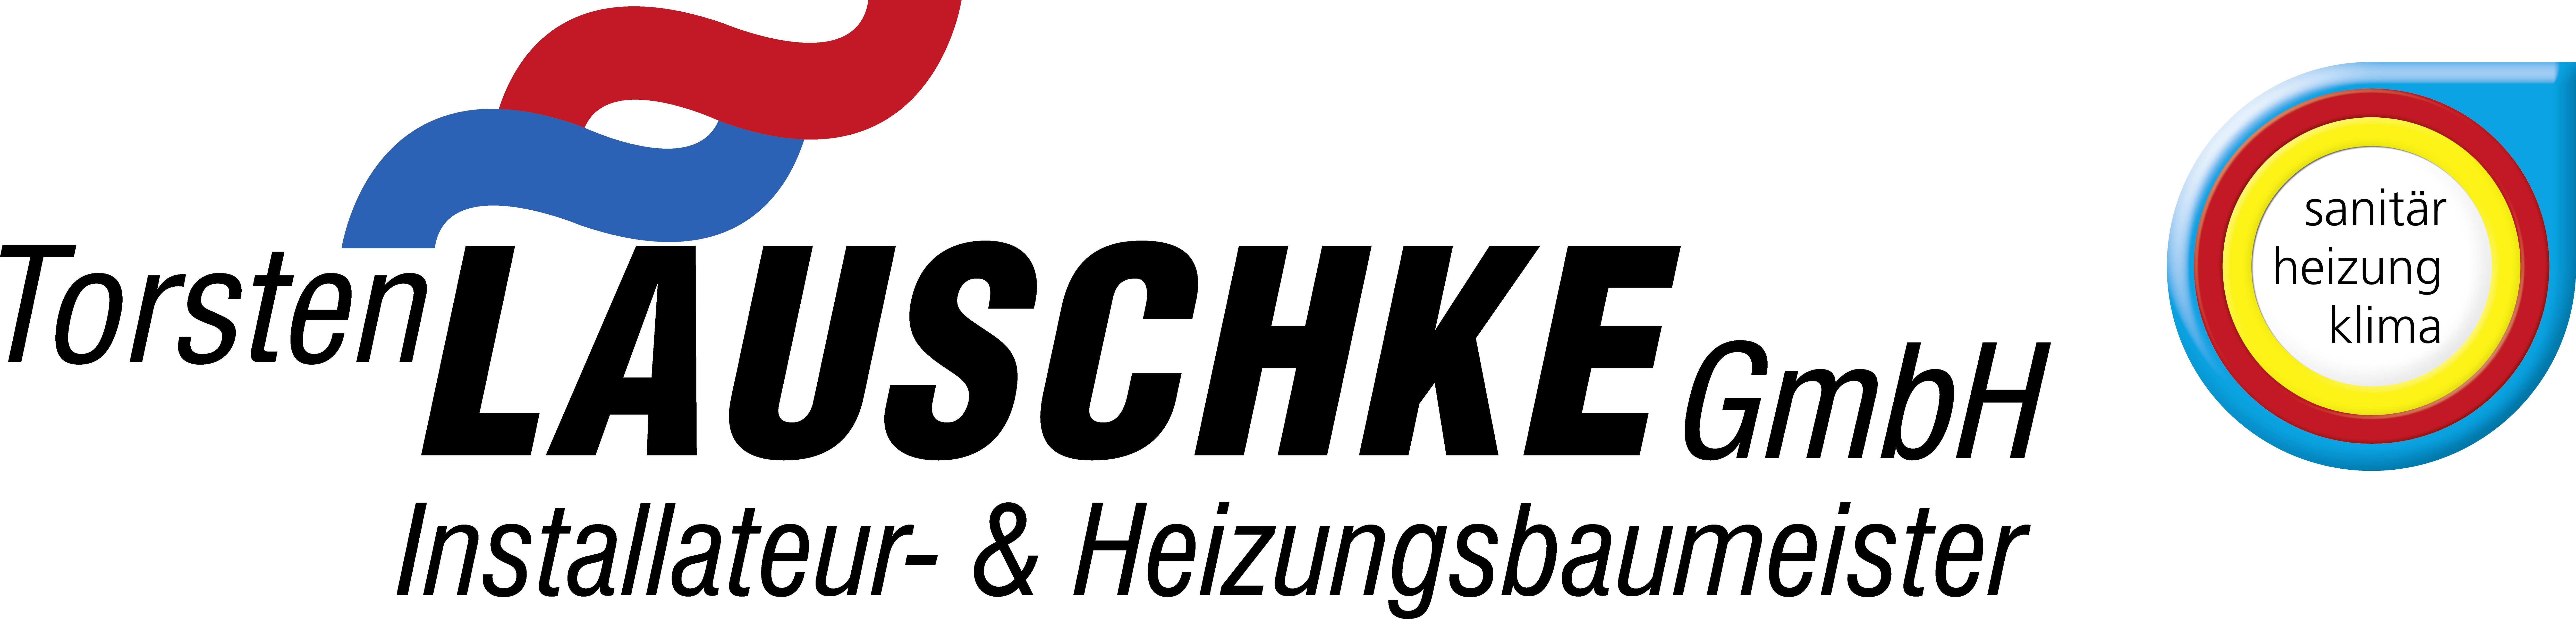 Logo Lauschke